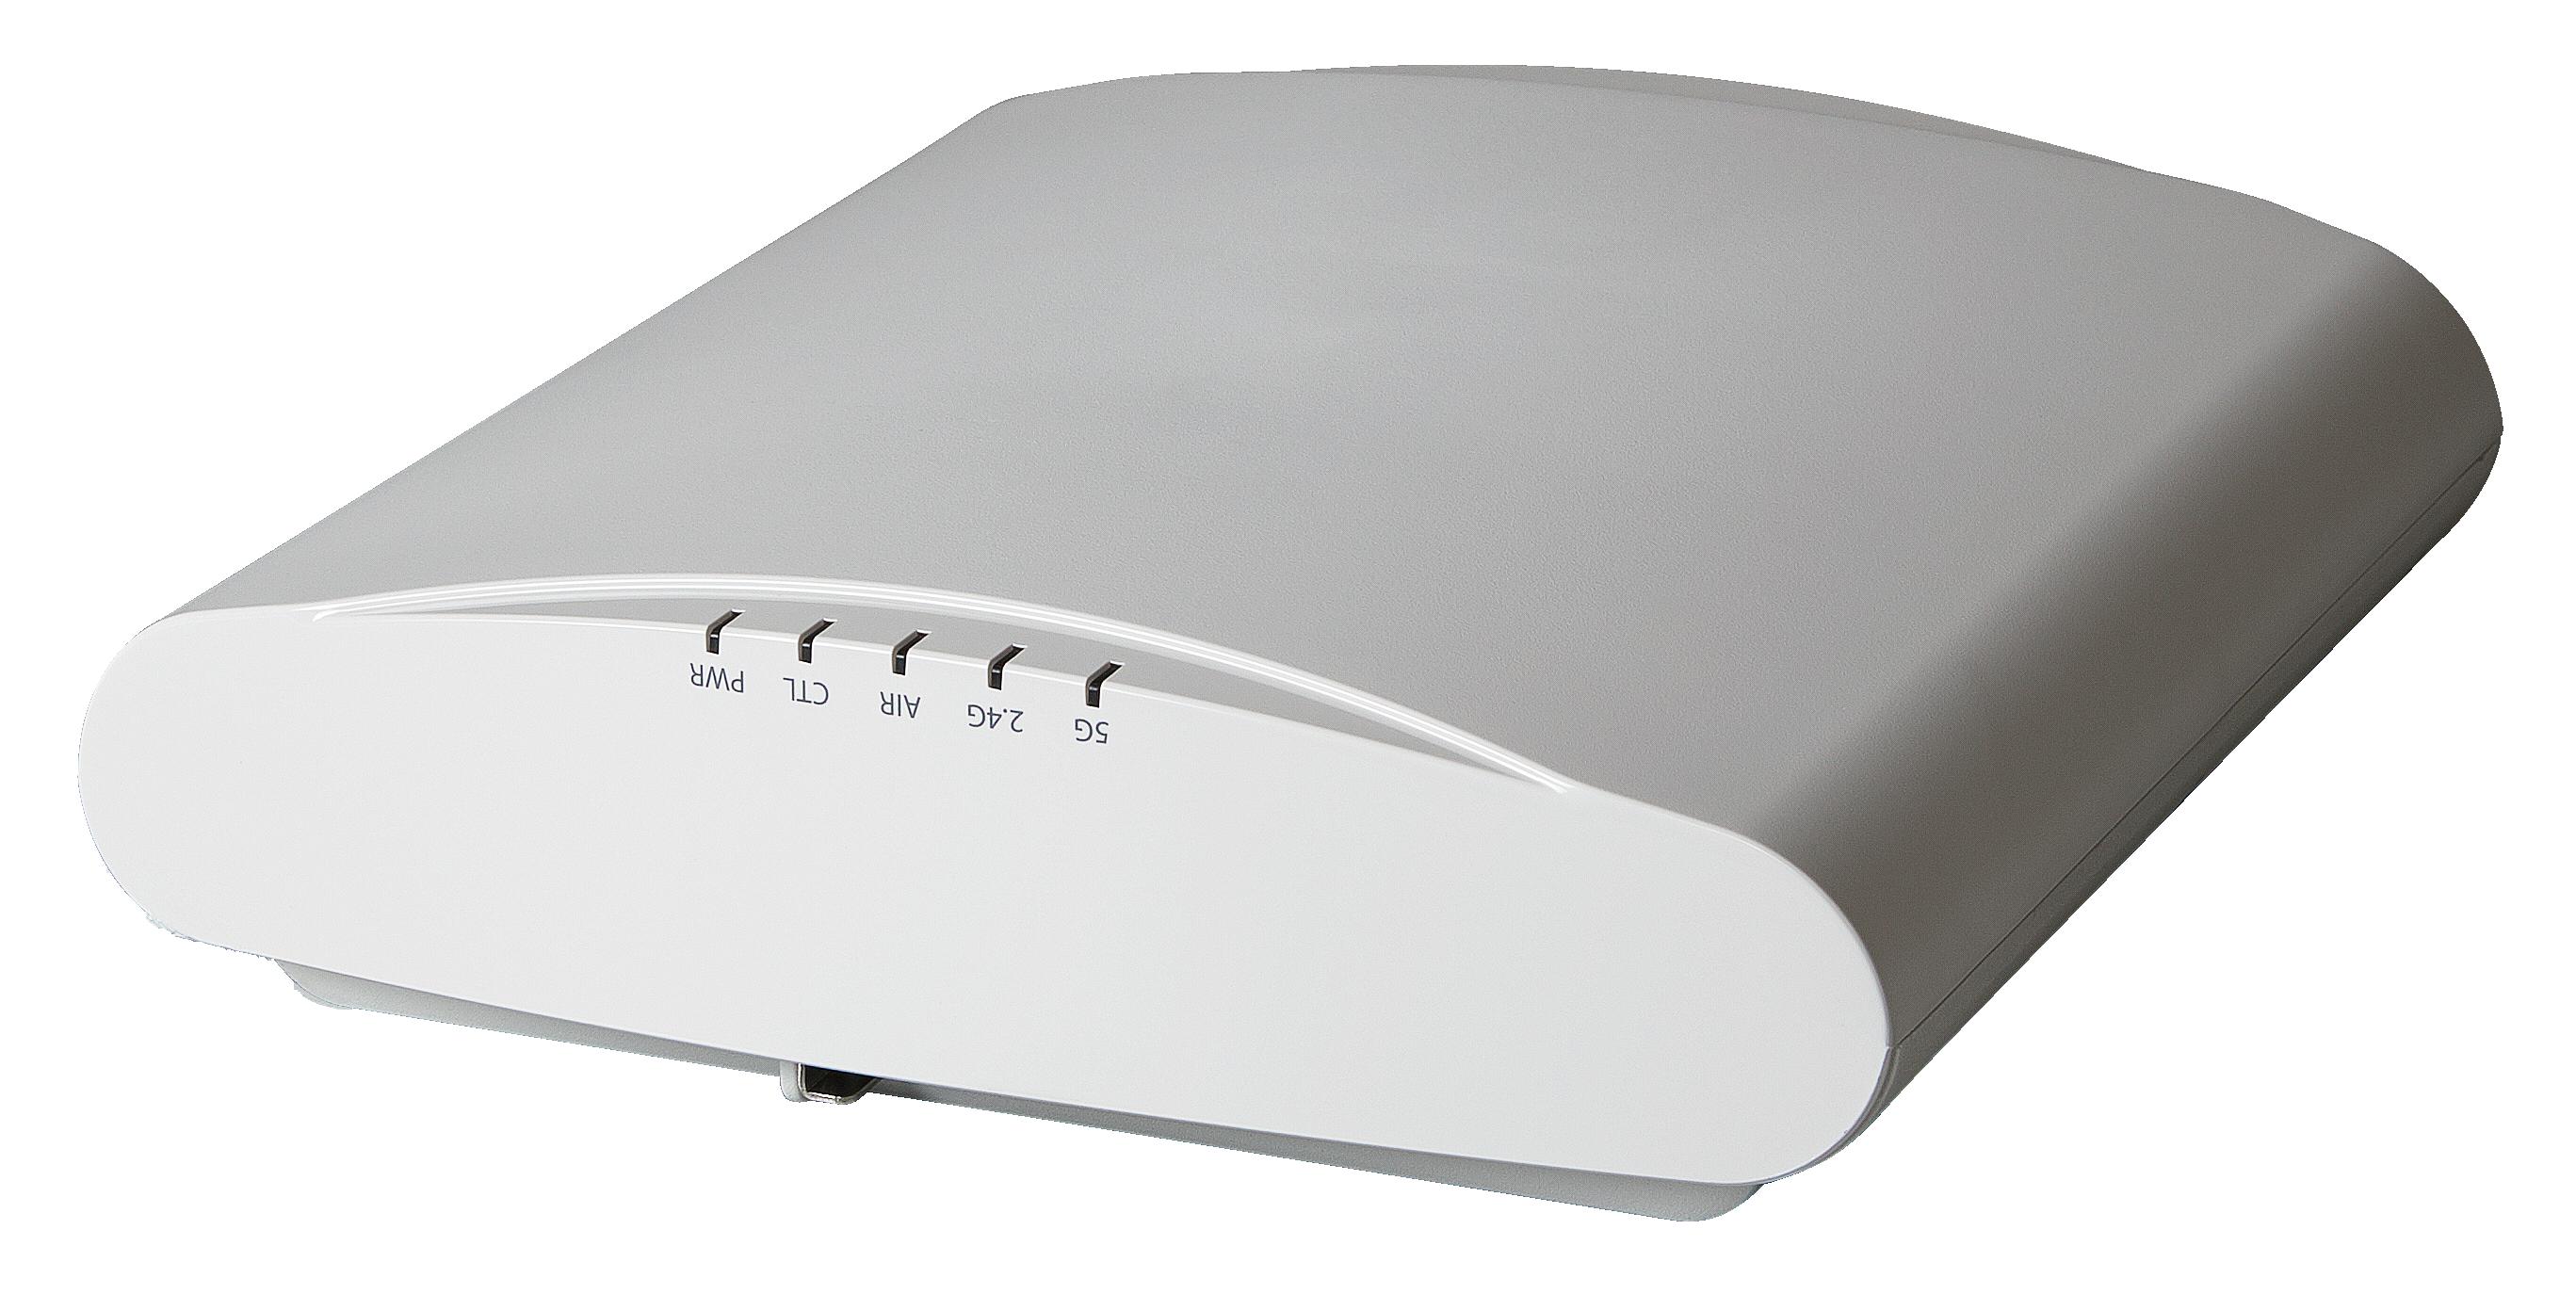 Ruckus R610 | Products | Ruckus Wireless Support